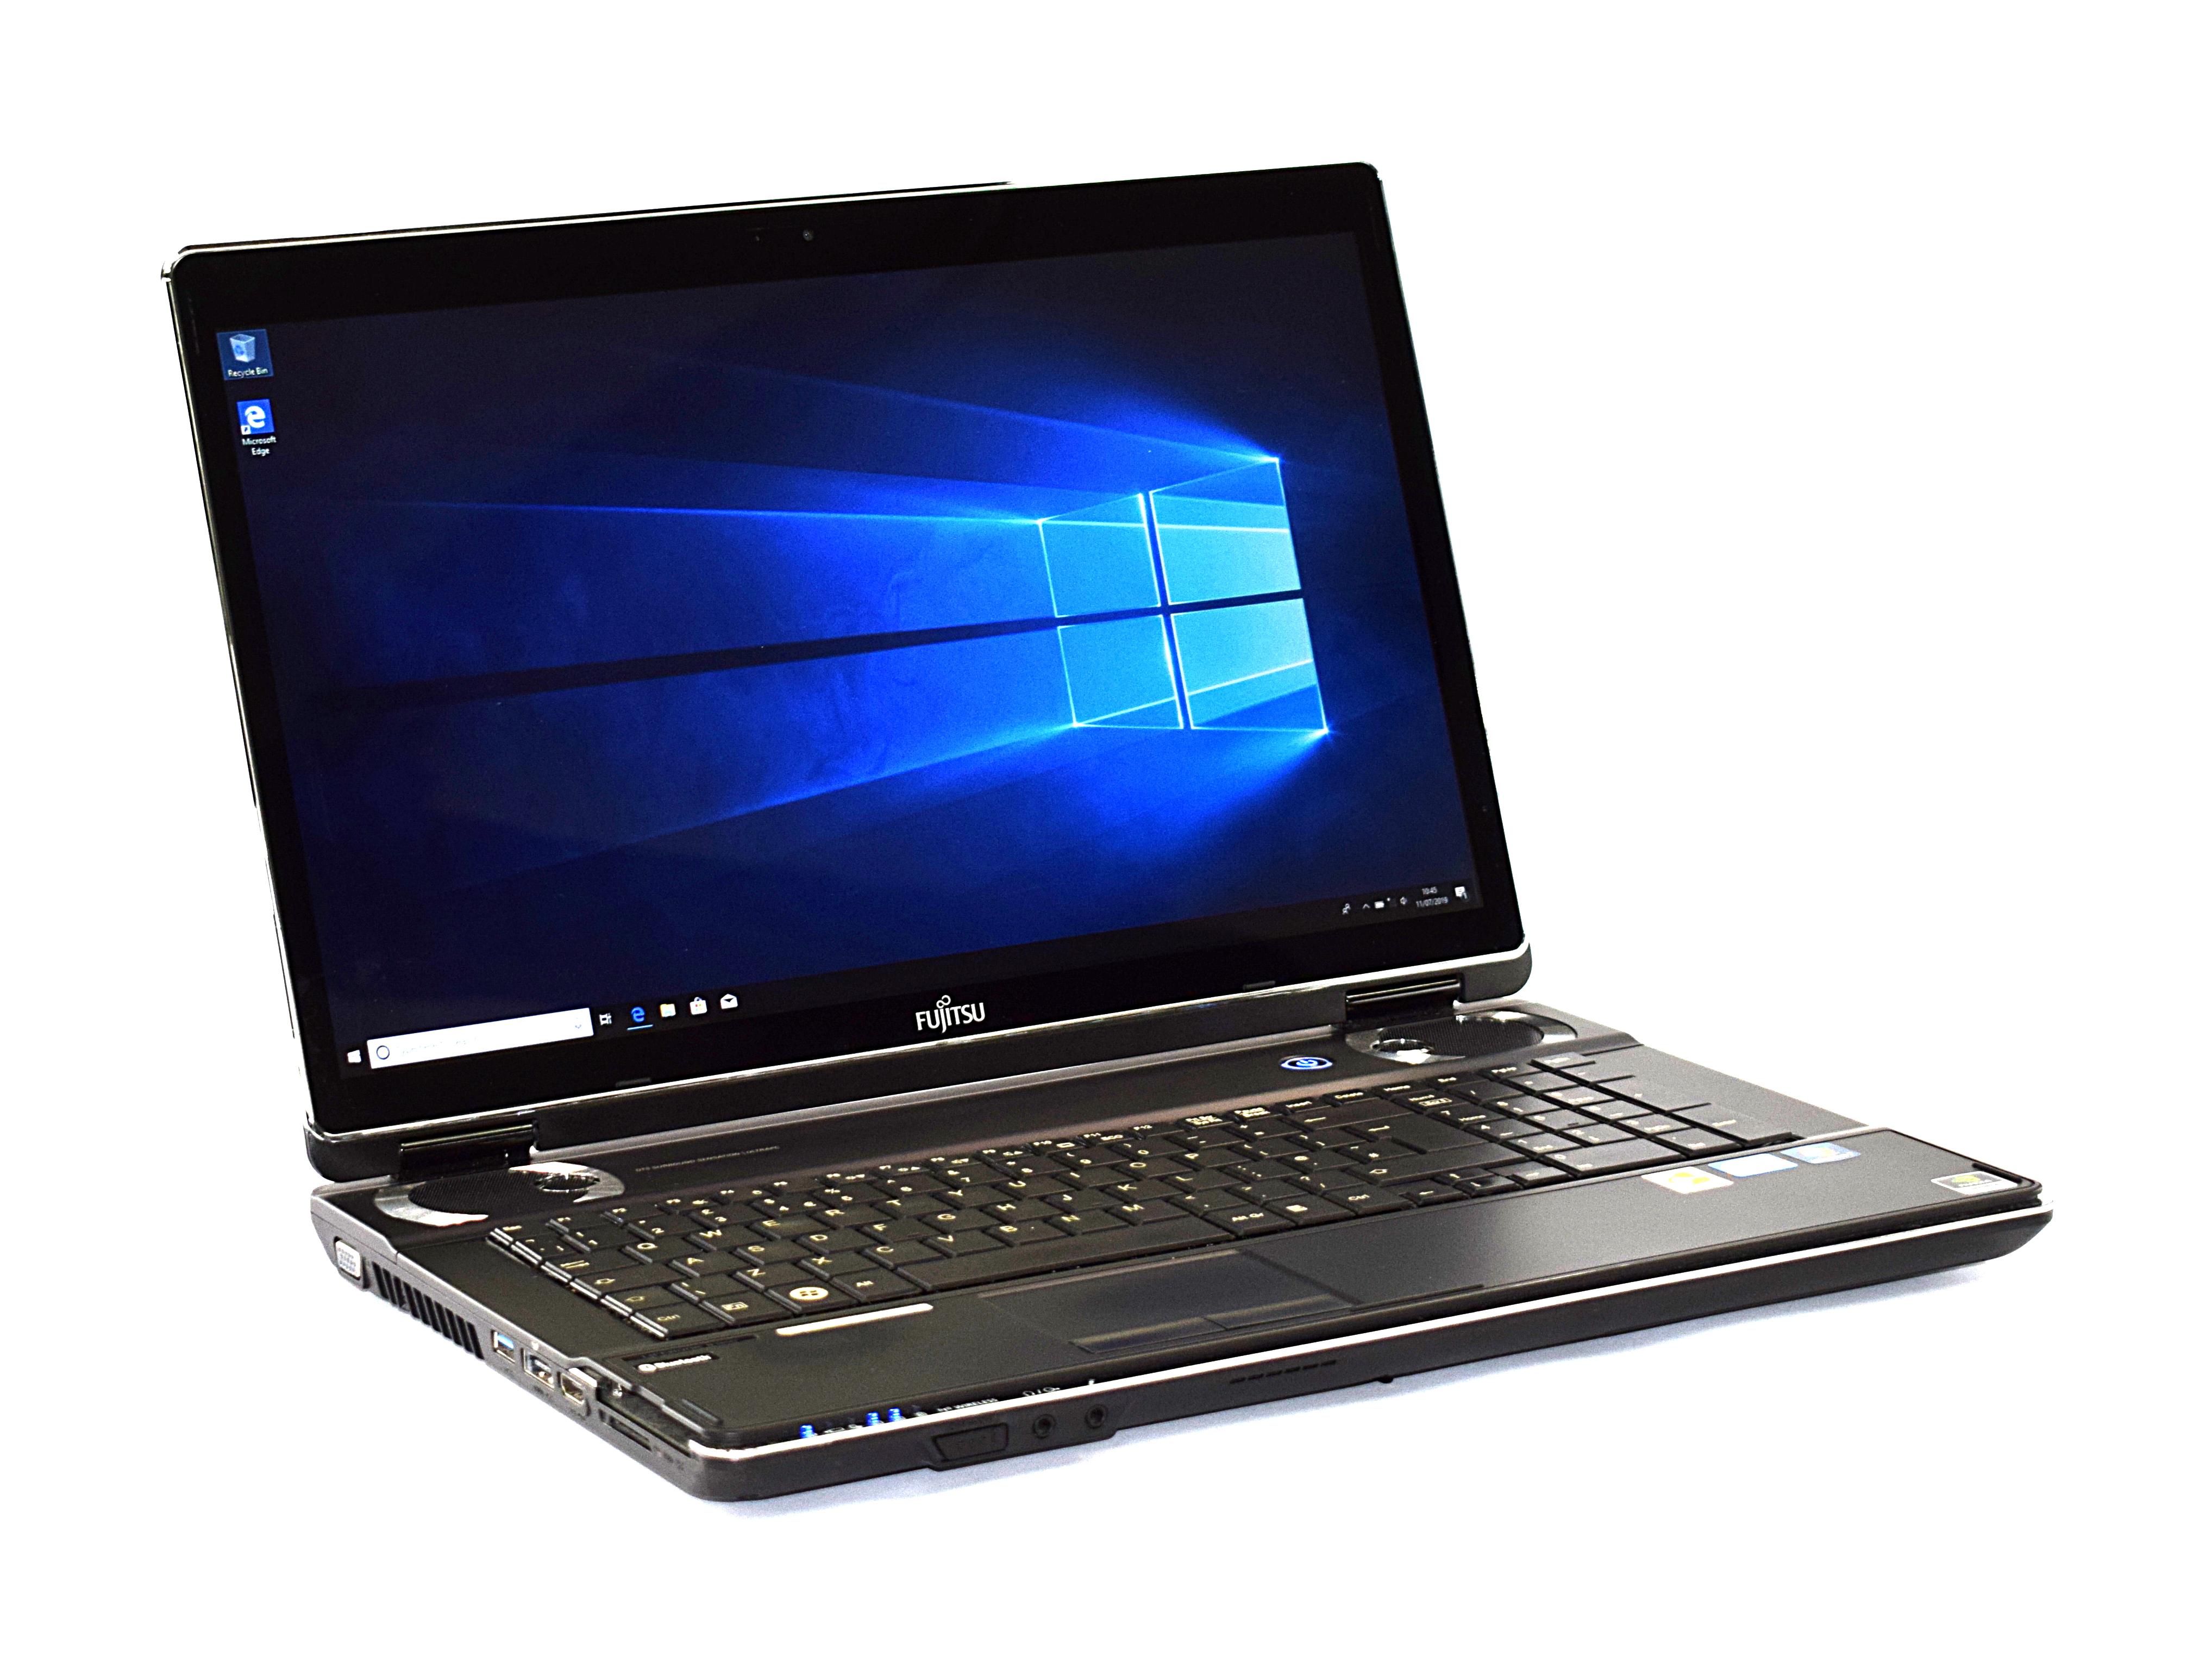 "Fujitsu Lifebook NH751 17.3"" Laptop Core i7-2670QM 8GB RAM 500GB HDD Windows 10"